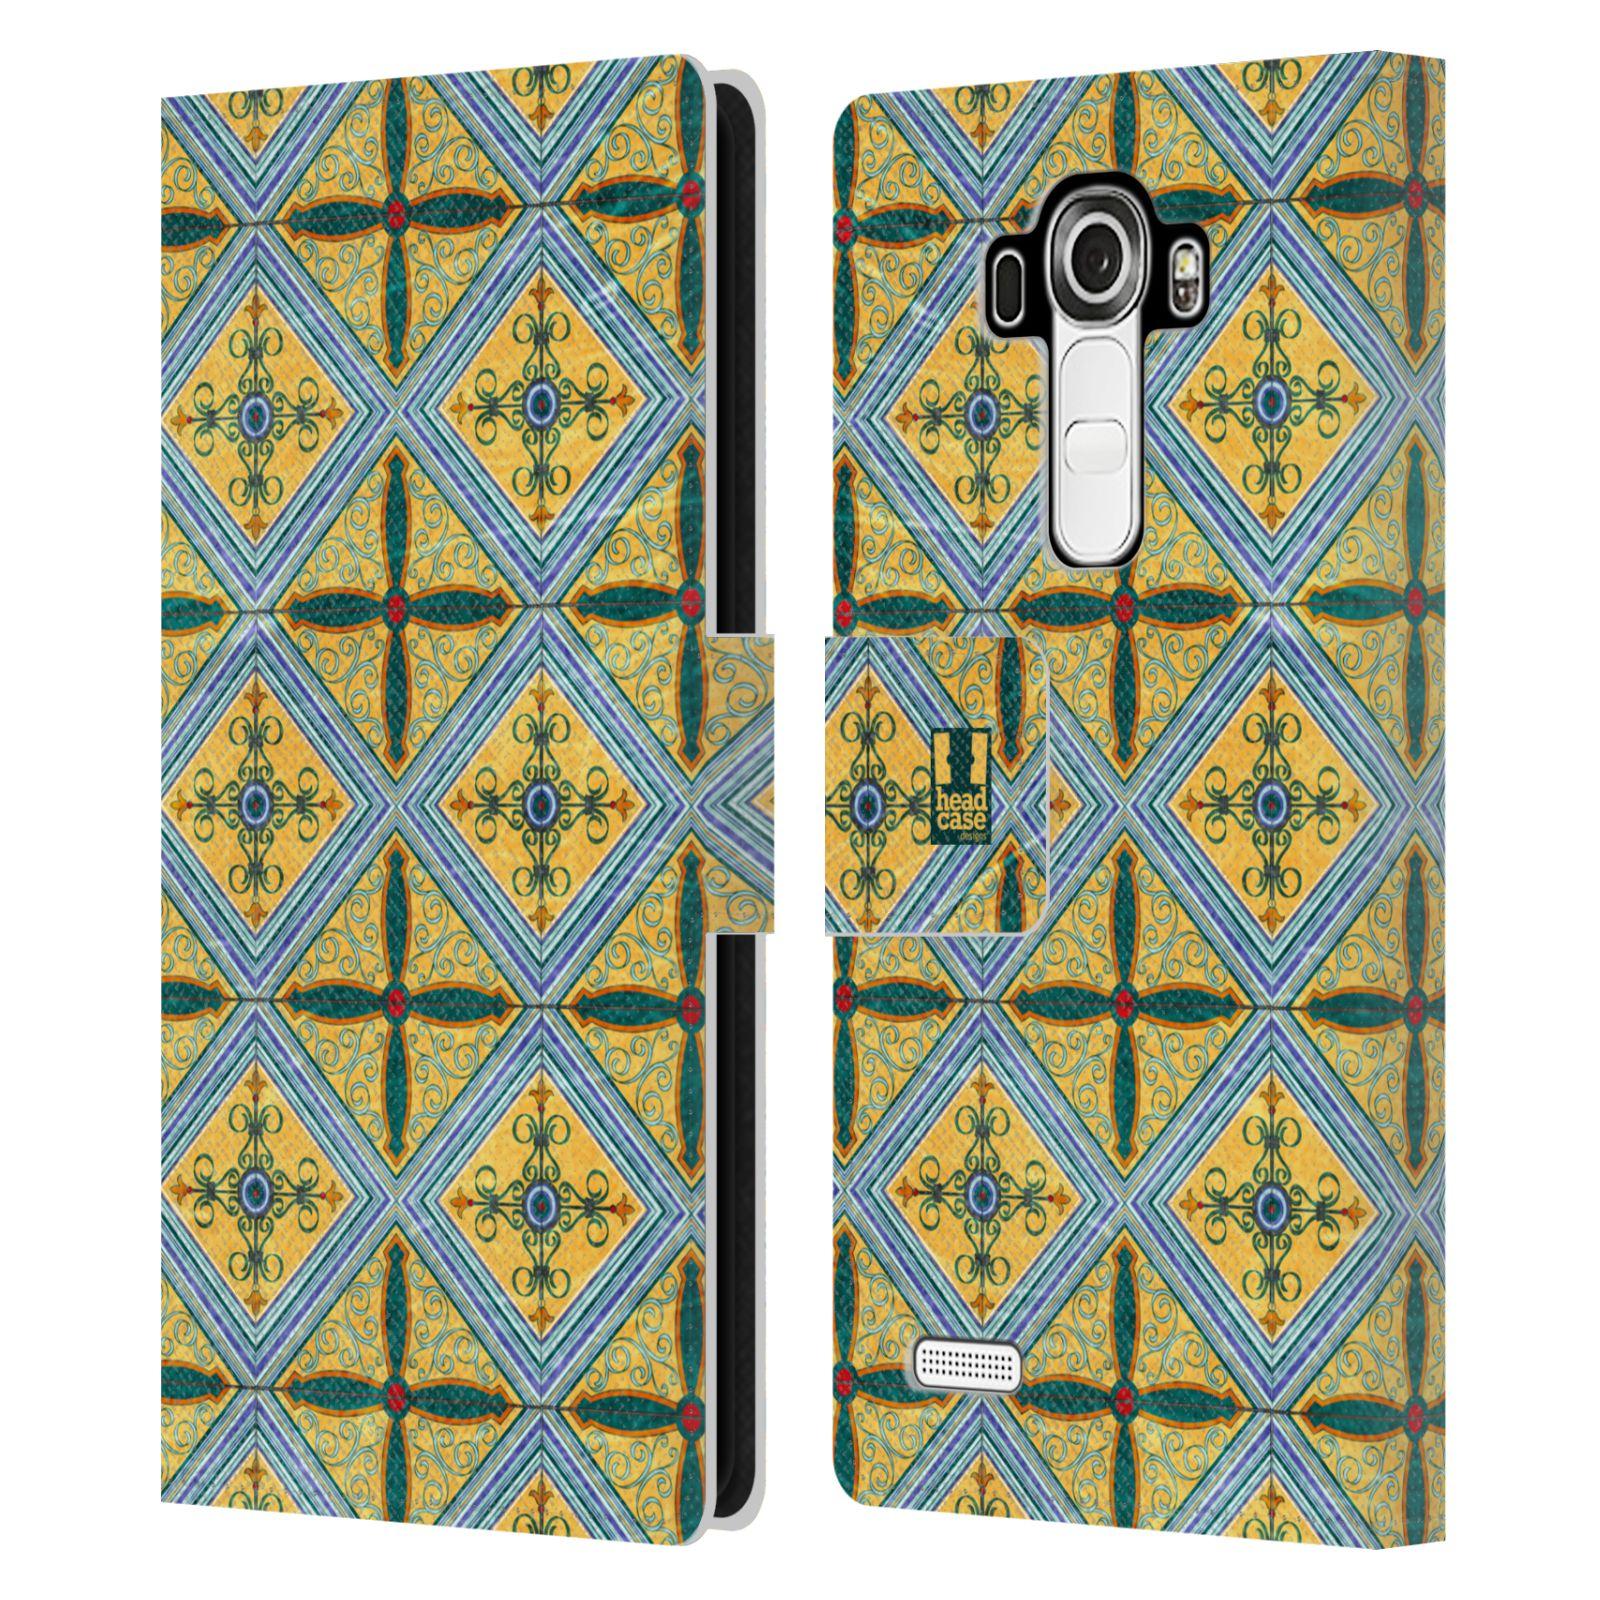 HEAD CASE Flipové pouzdro pro mobil LG G4 (H815) ARABESKA CERAMIC žlutá